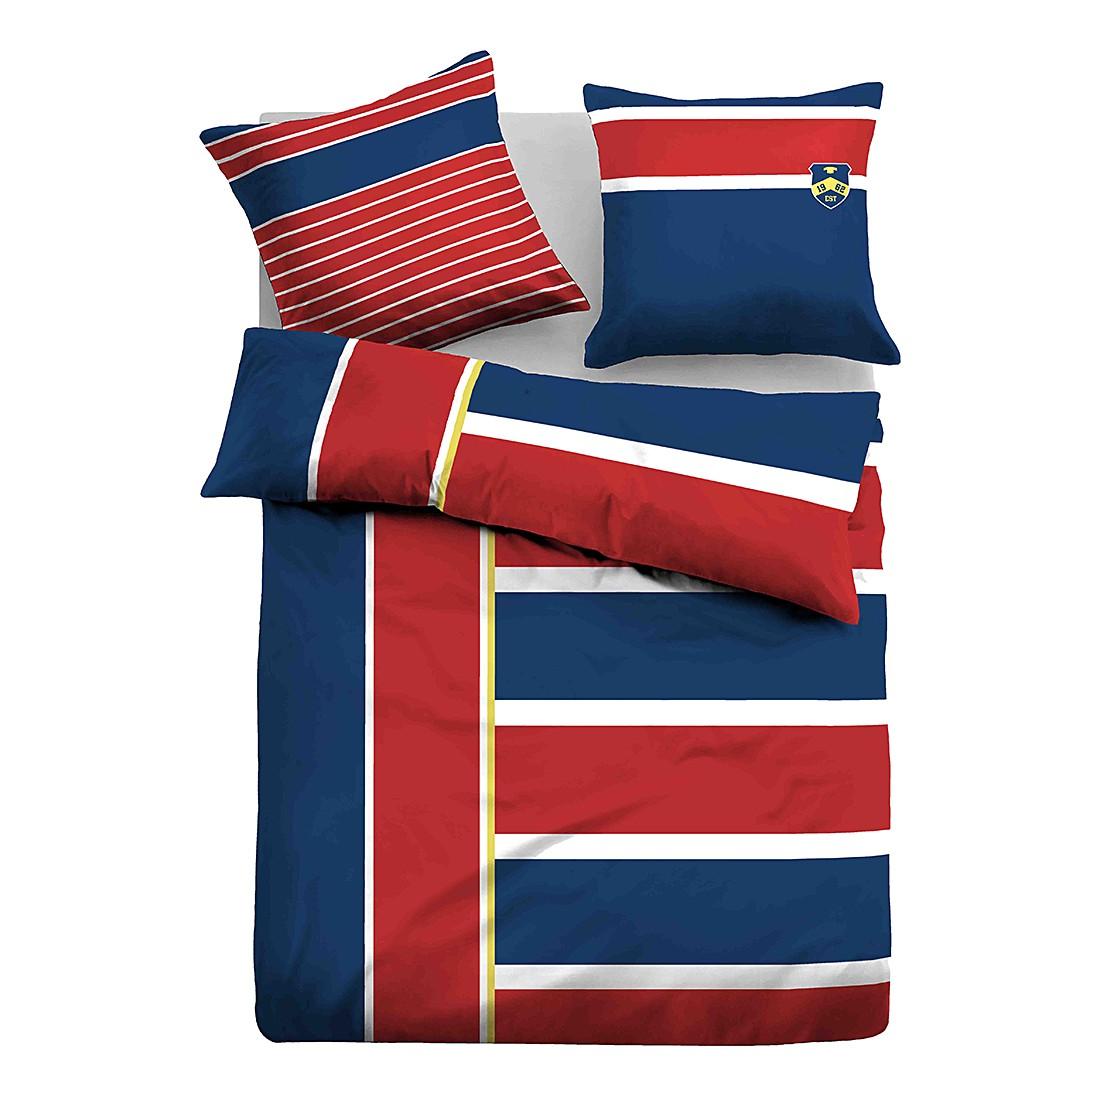 heimtextilien bettw sche biber bettw sche archive. Black Bedroom Furniture Sets. Home Design Ideas